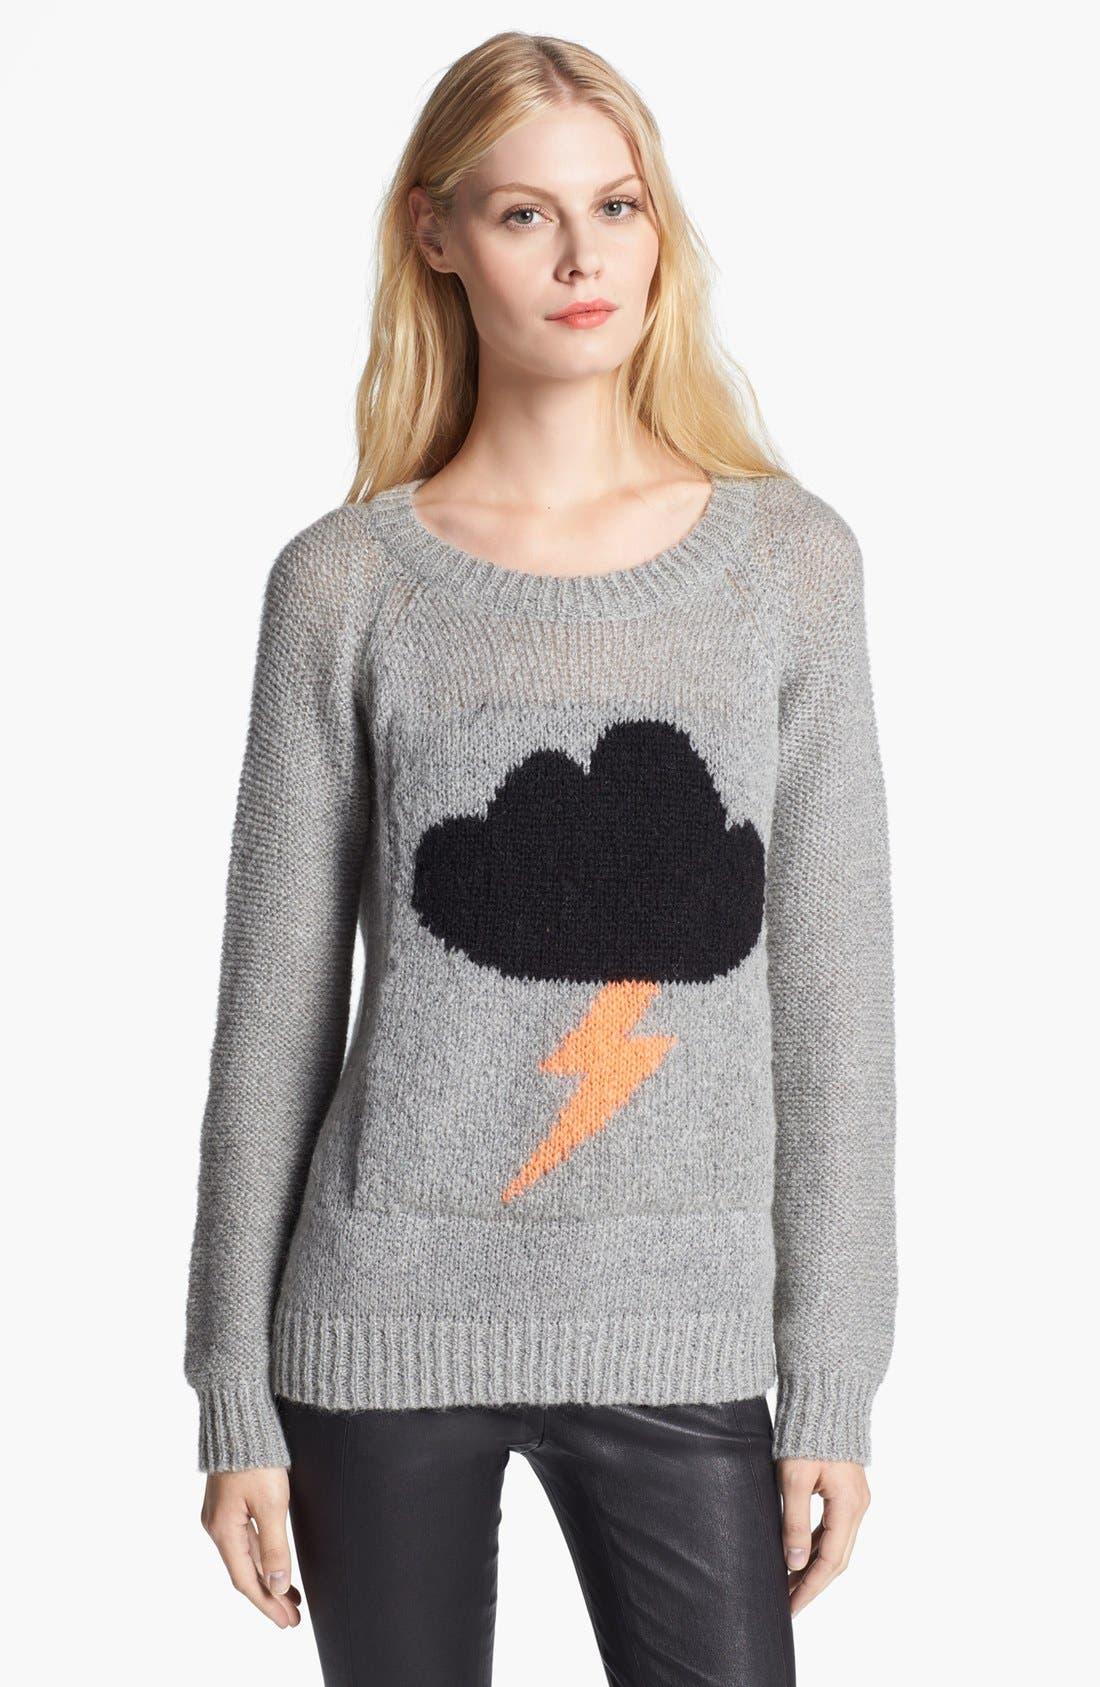 Main Image - Elizabeth and James 'Raincloud' Intarsia Knit Sweater